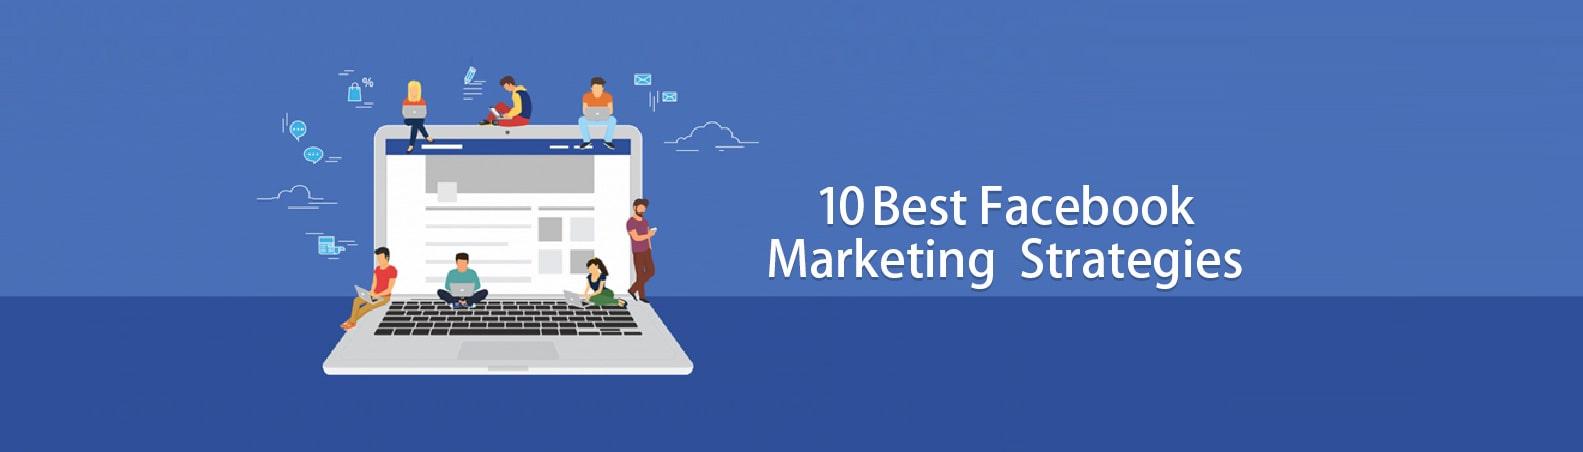 10 Effective Facebook Digital Marketing Strategies for Business